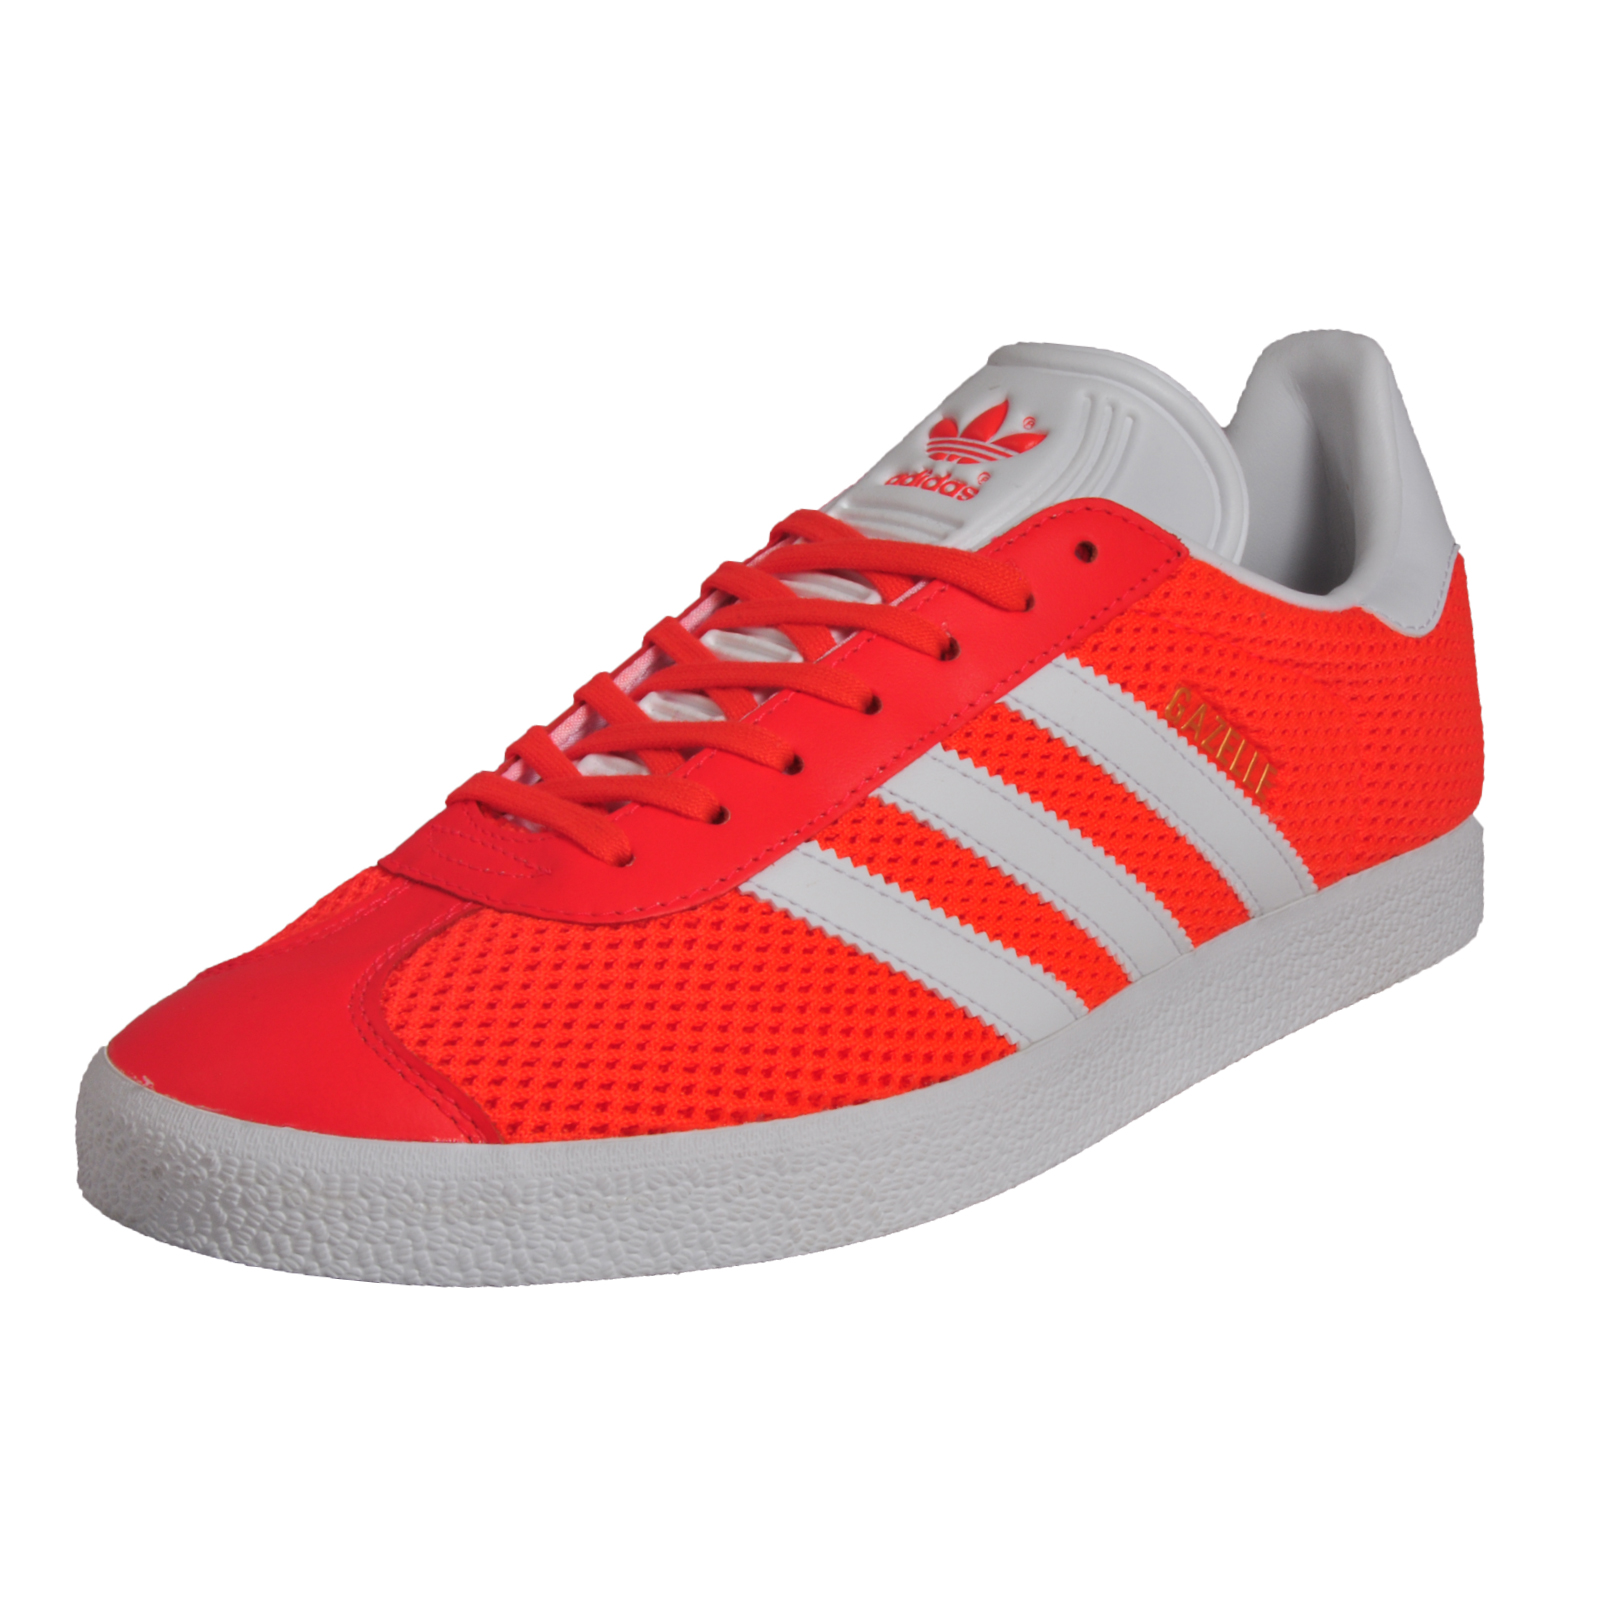 1c5ff55b9db0 Details about Adidas Originals Gazelle Men s Casual Classic Retro Trainers